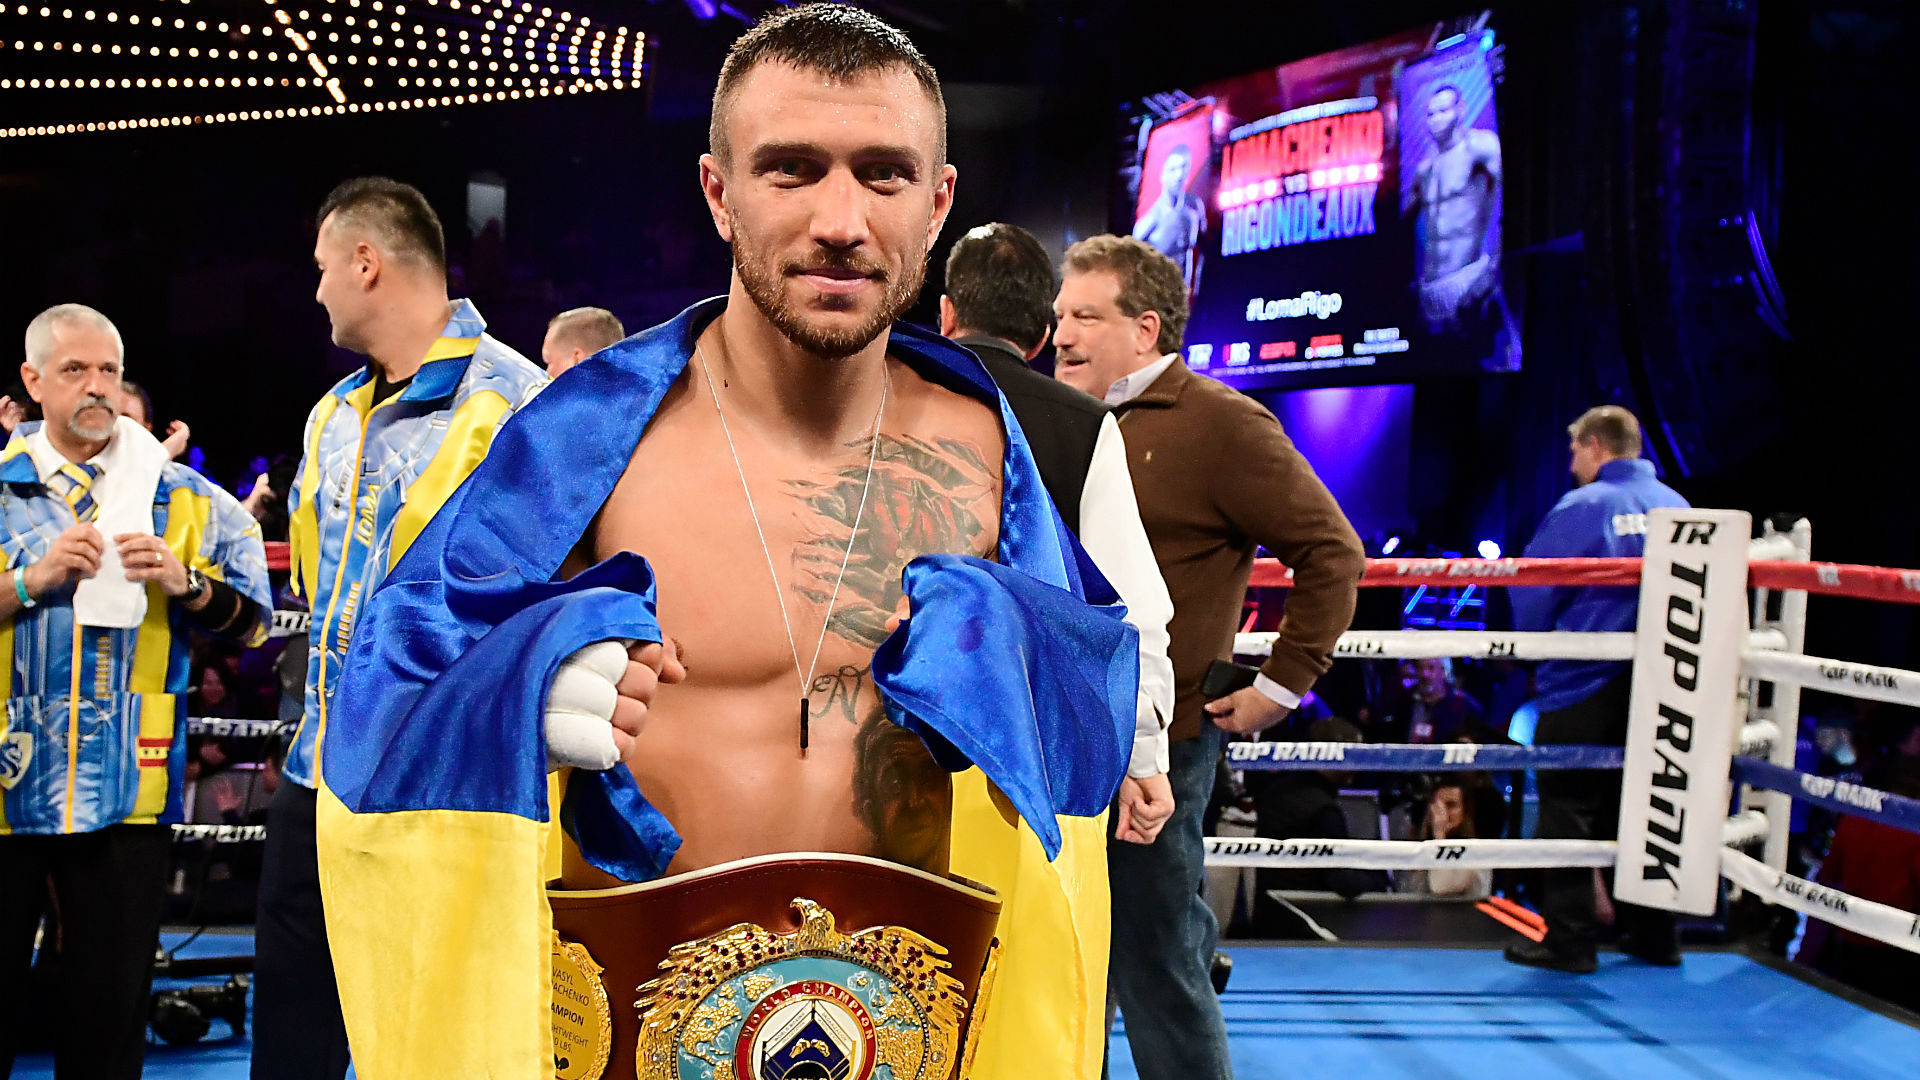 Lomachenko vs. Linares results: Vasiliy Lomachenko makes boxing history with KO victory